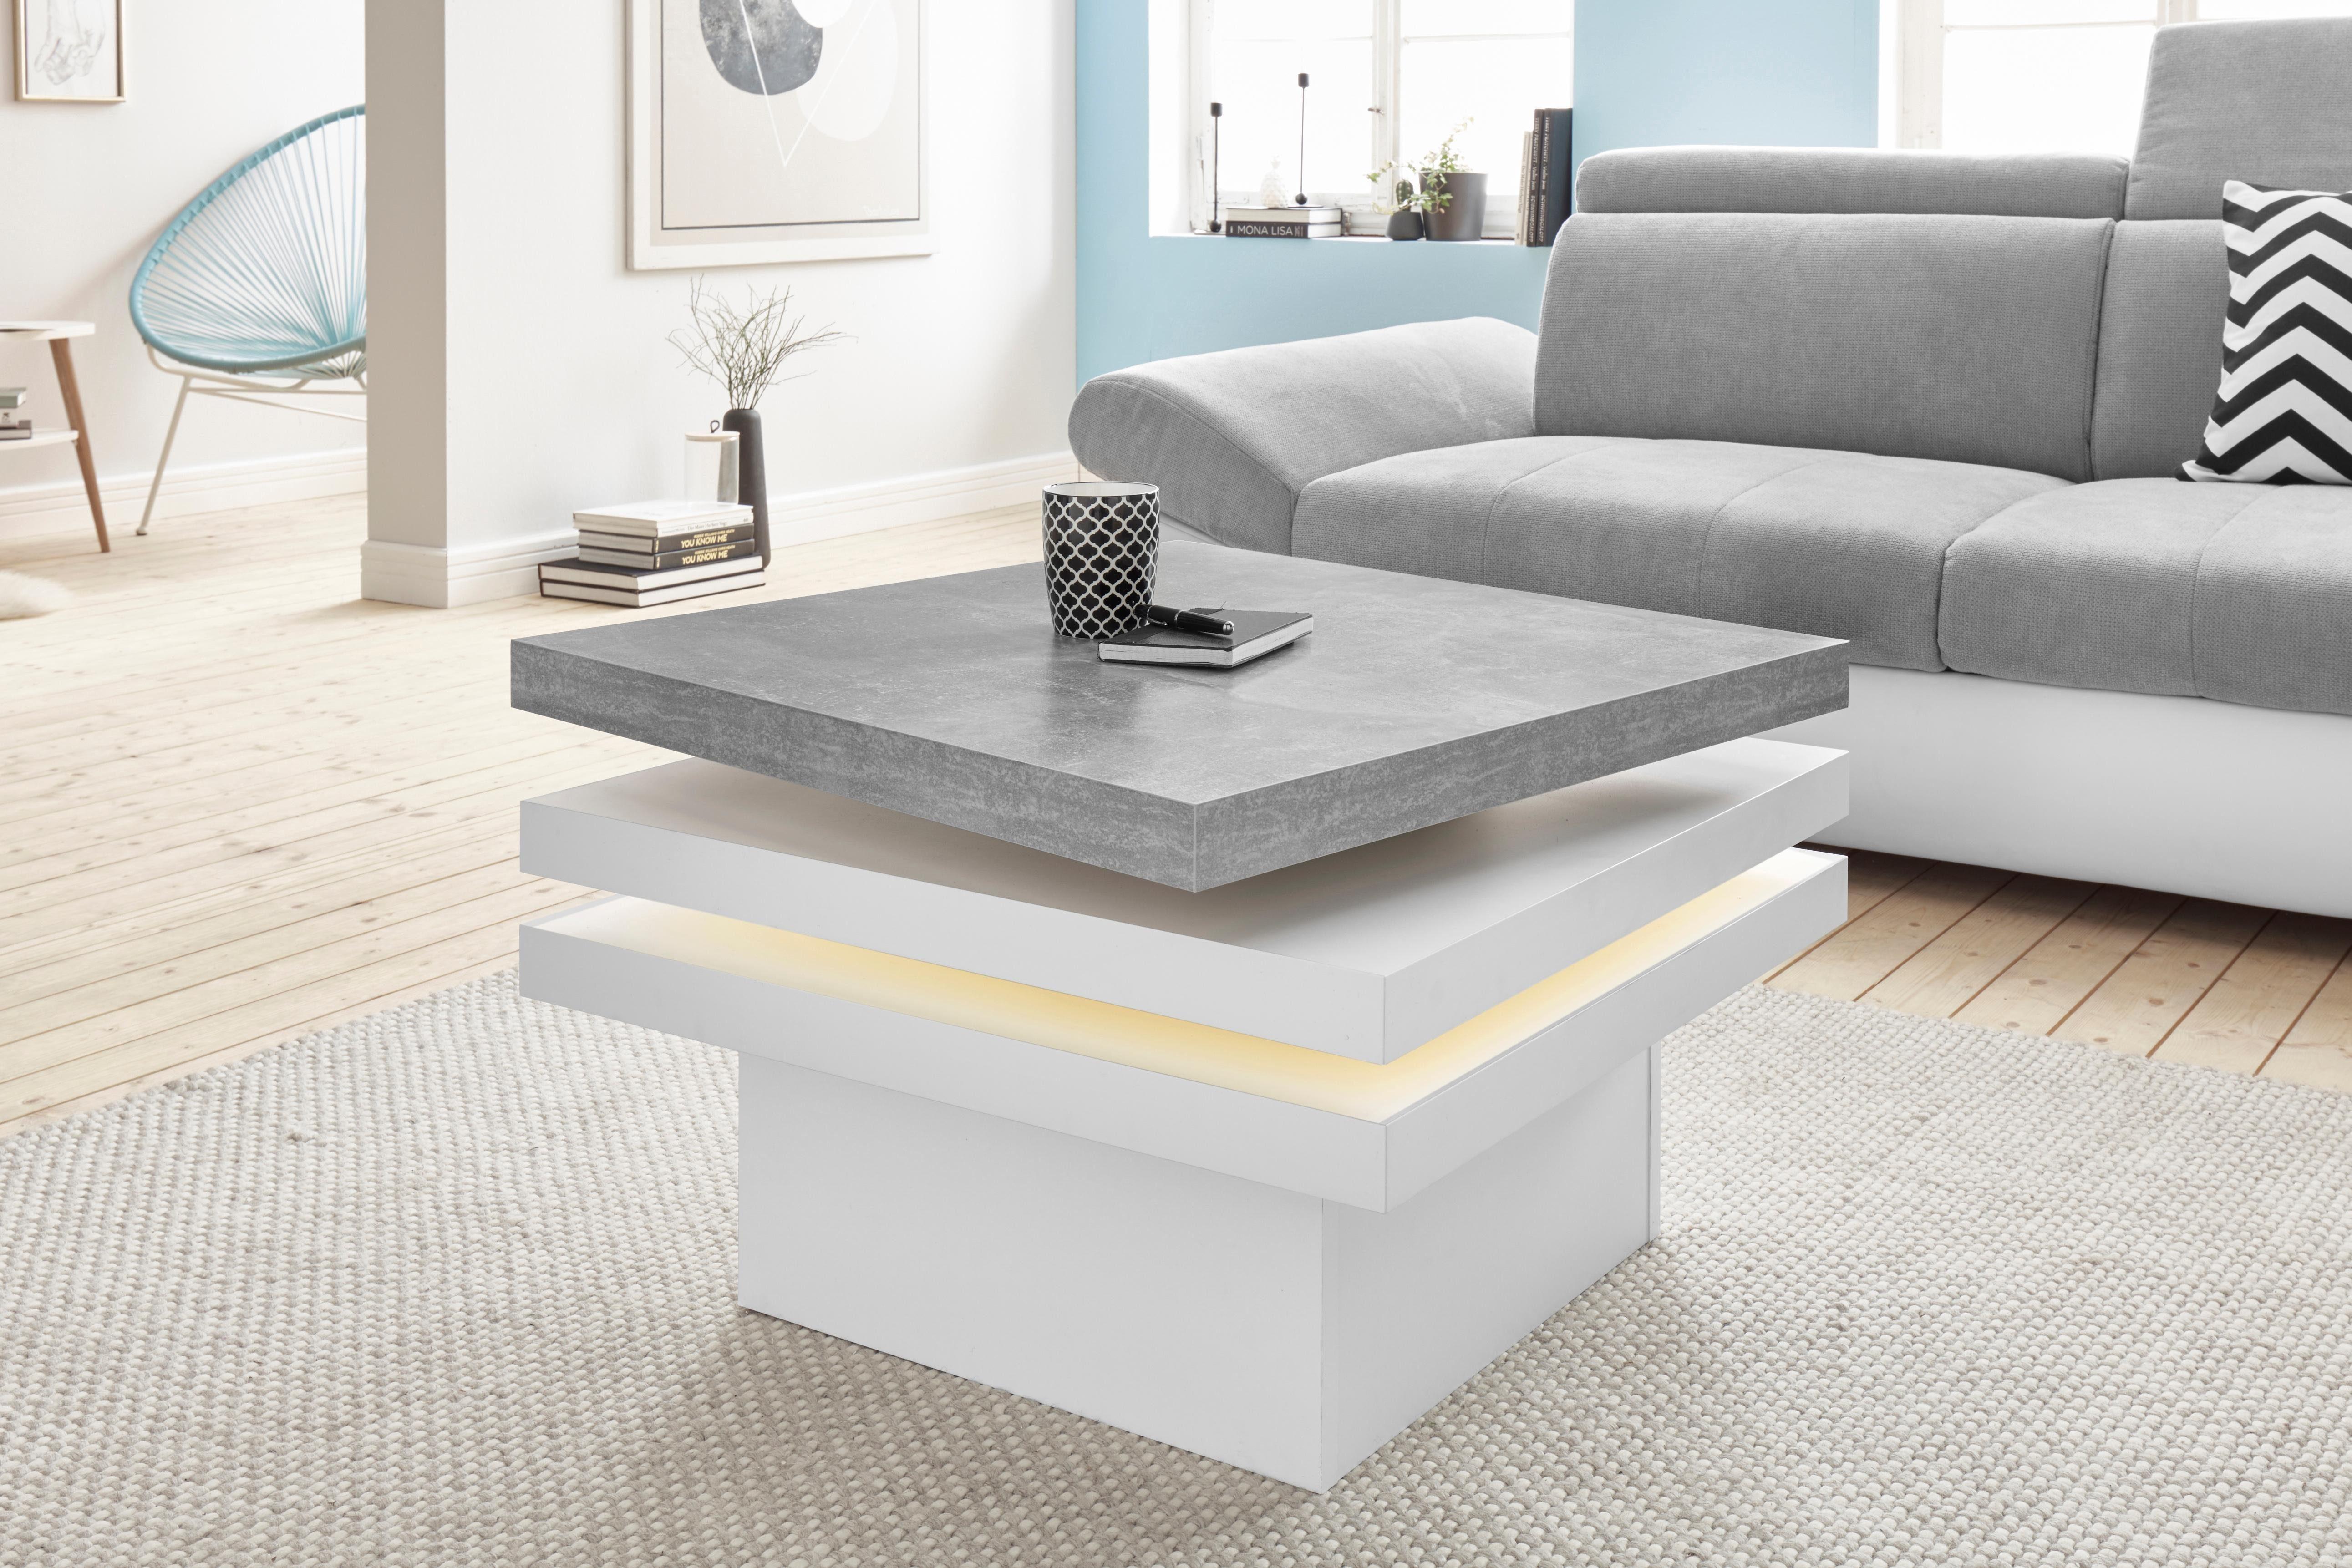 Salon Tafel Wit : Salontafel met led verlichting makkelijk besteld otto